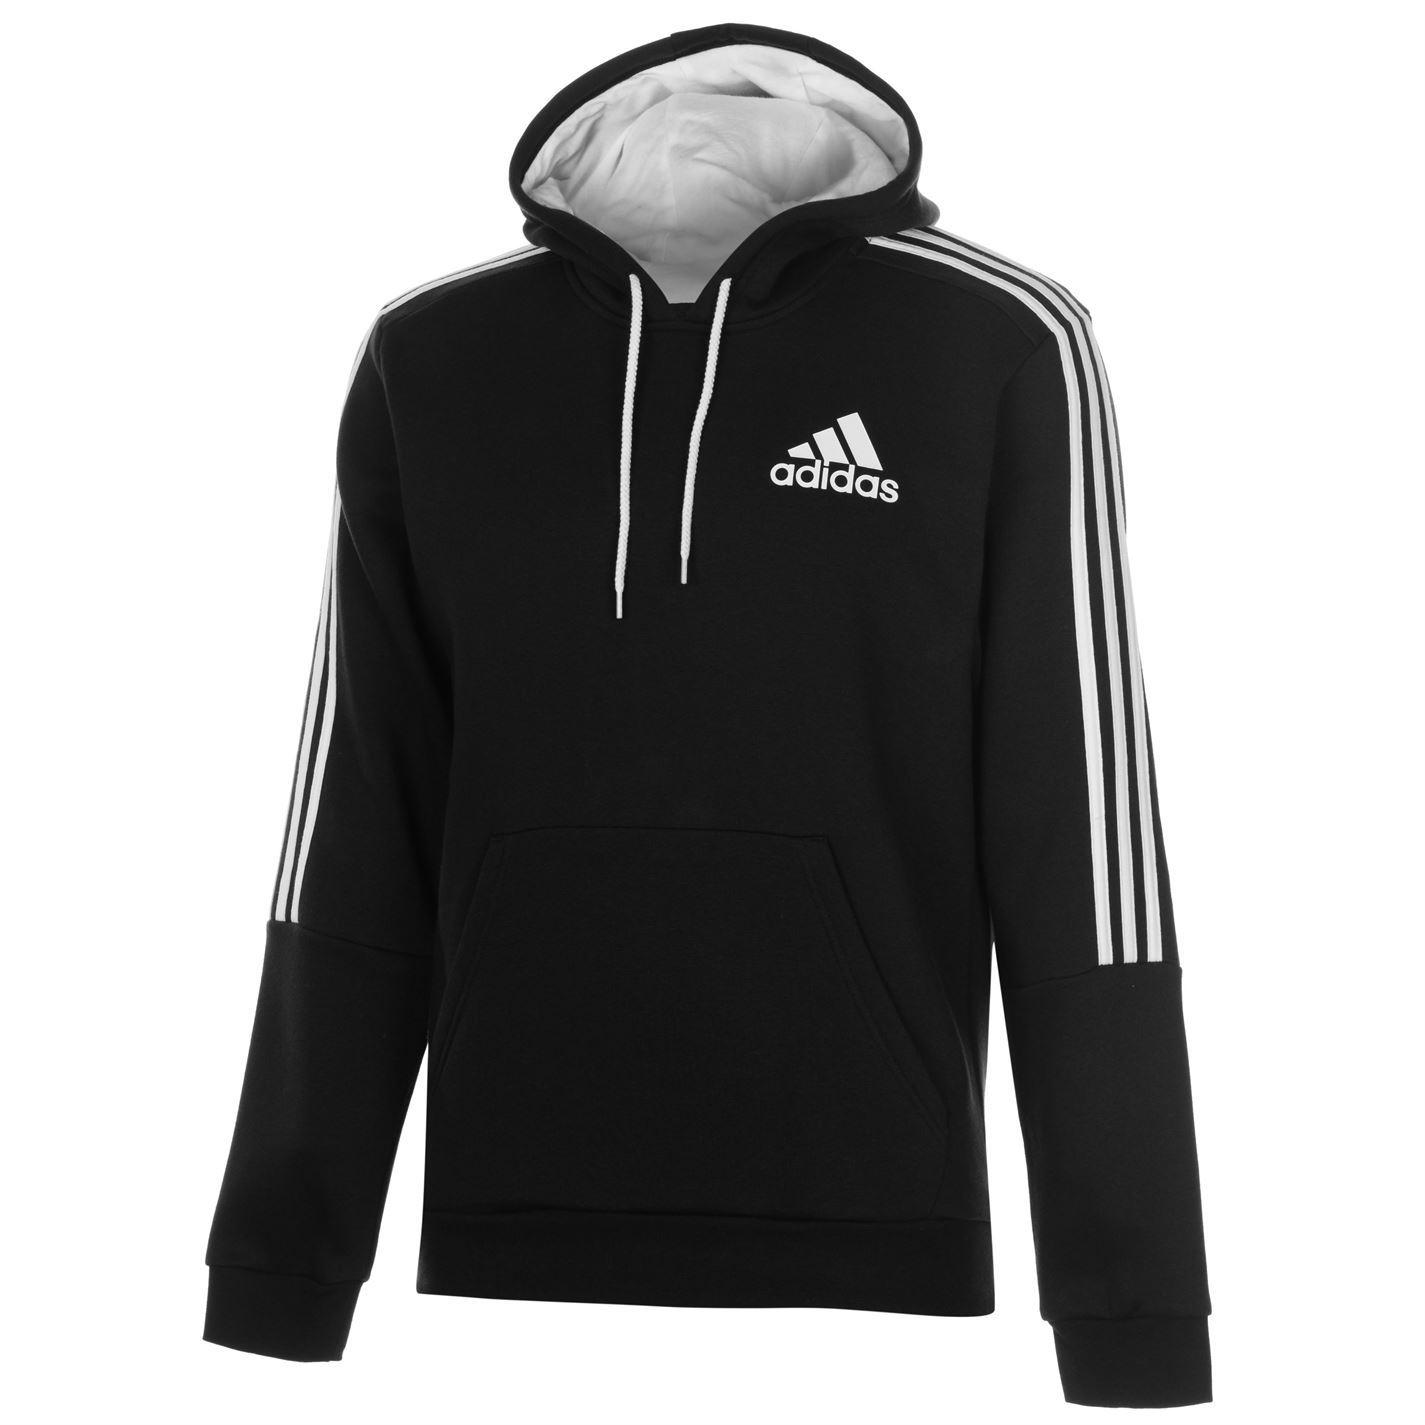 ... adidas 3 Stripes Logo Pullover Hoody Mens Hoodie Sweatshirt Sweater  Hooded Top 3034dc1d7cb